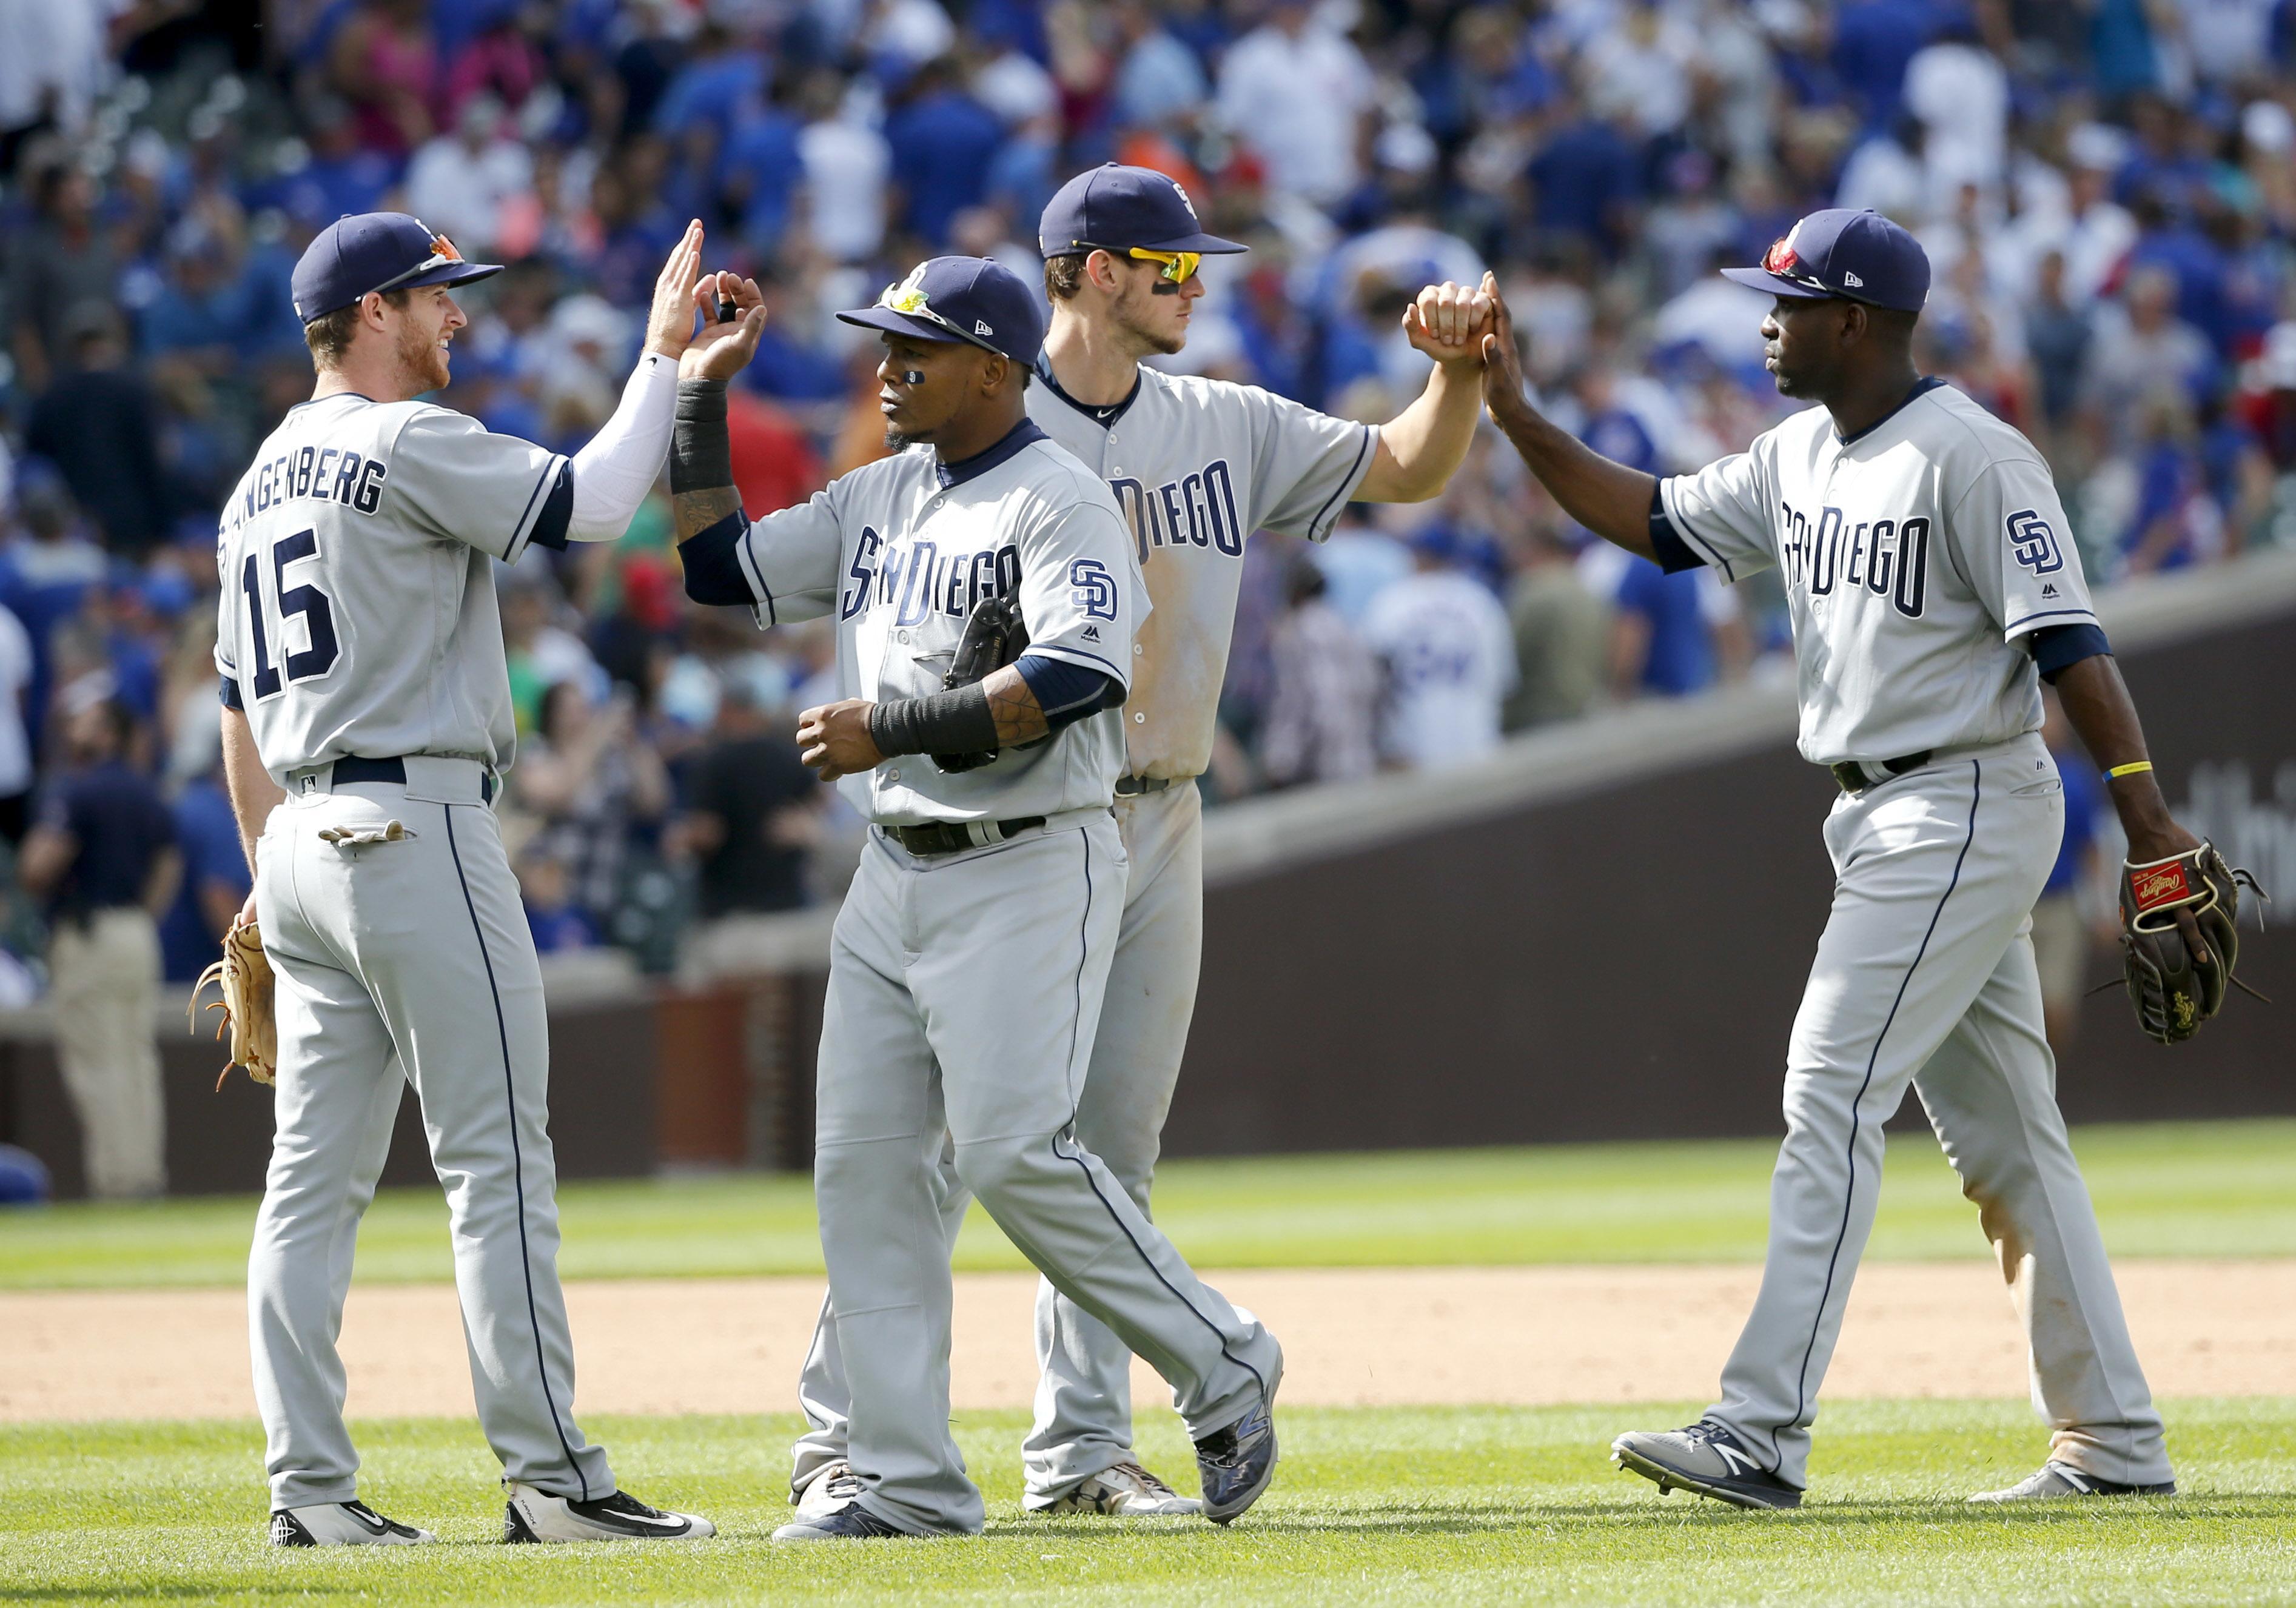 Padres_cubs_baseball_49001